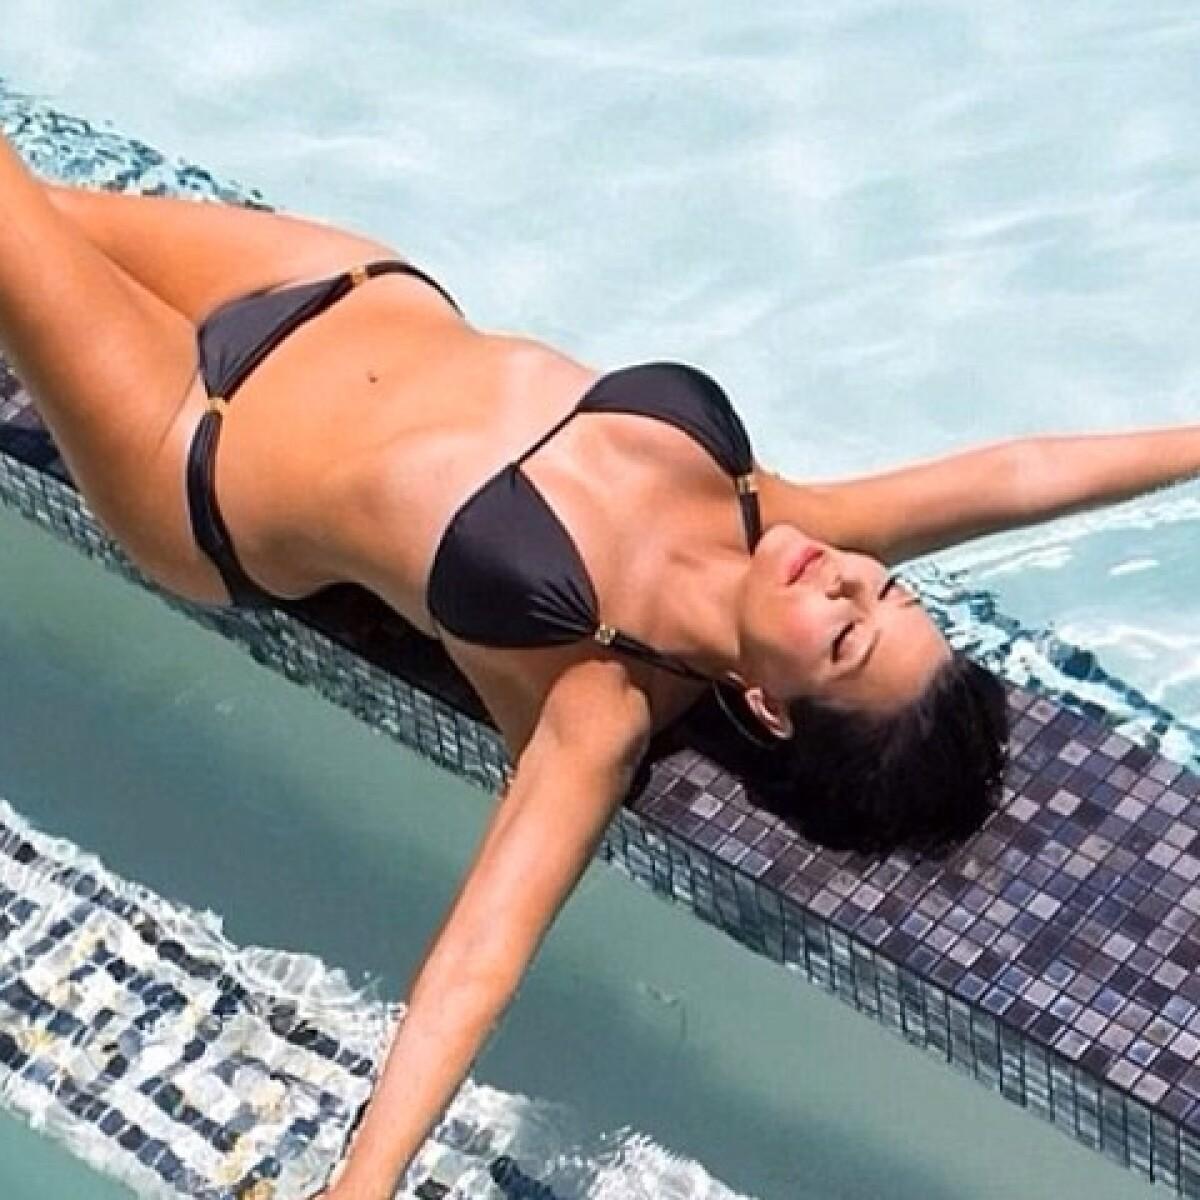 ¡Hot mamma! Kris Jenner disfruta el sol en bikini